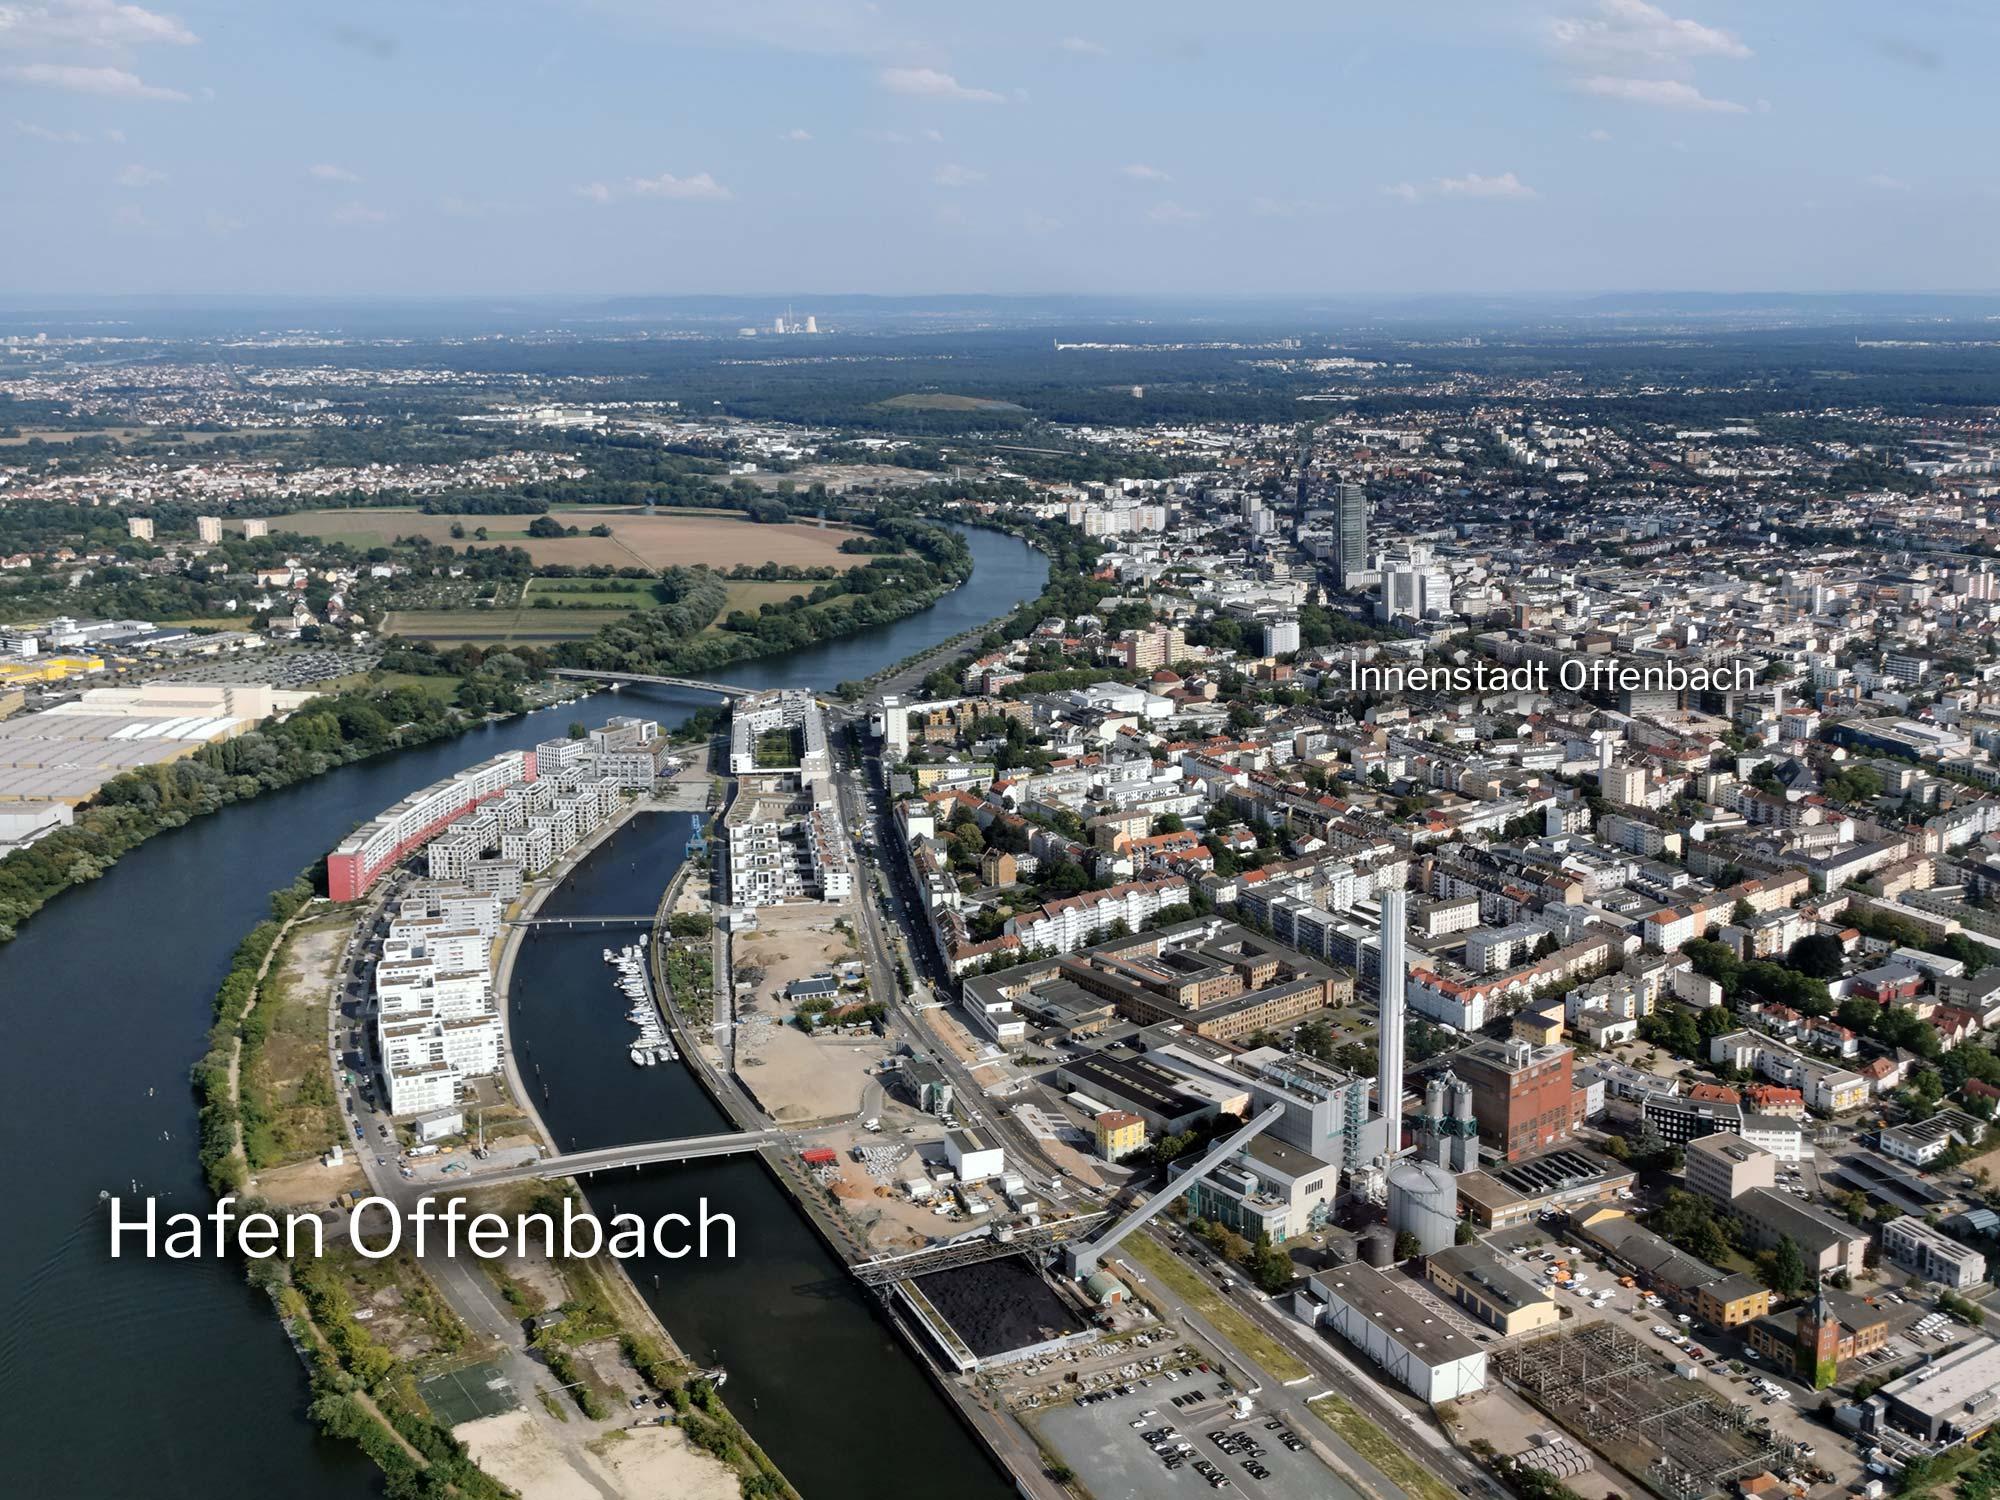 Hafen Offenbach - Offenbacher Hafenviertel Luftbild - Panorama Offenbach am Main